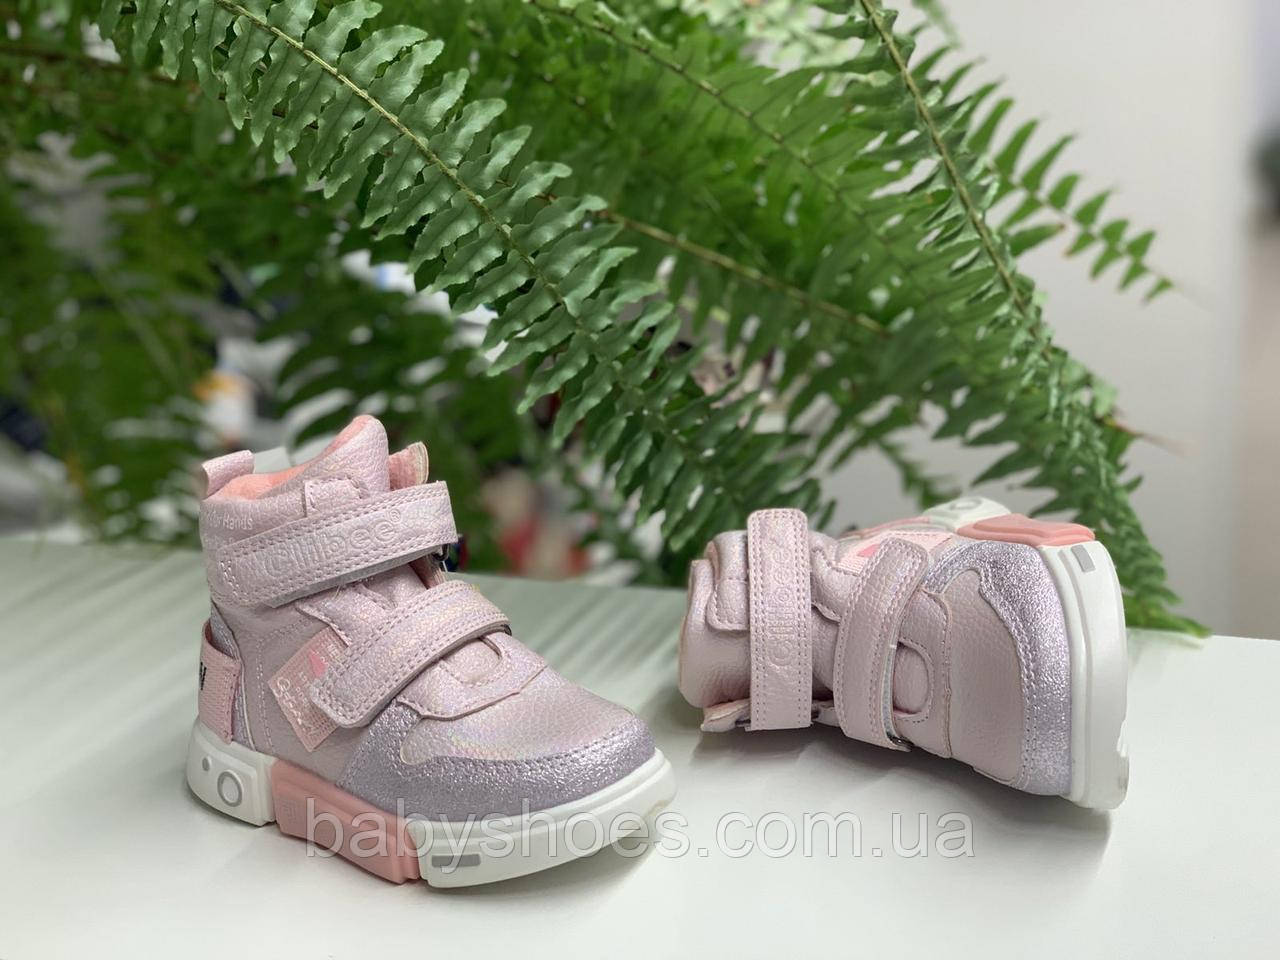 Демисезонные ботинки для девочки,Clibee р.23-27,ДД-292